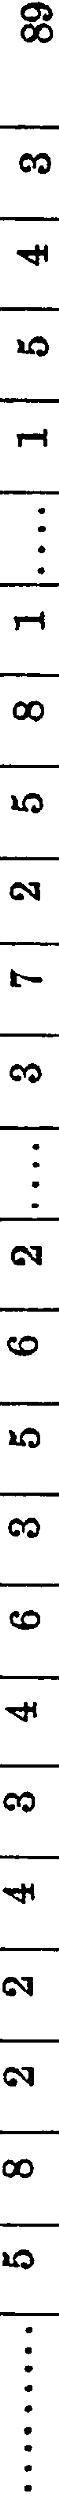 [merged small][merged small][merged small][merged small][merged small][merged small][merged small][merged small][merged small][merged small][merged small][merged small][merged small][merged small][merged small][merged small][merged small][merged small][merged small][ocr errors][merged small][merged small][merged small][merged small][merged small]